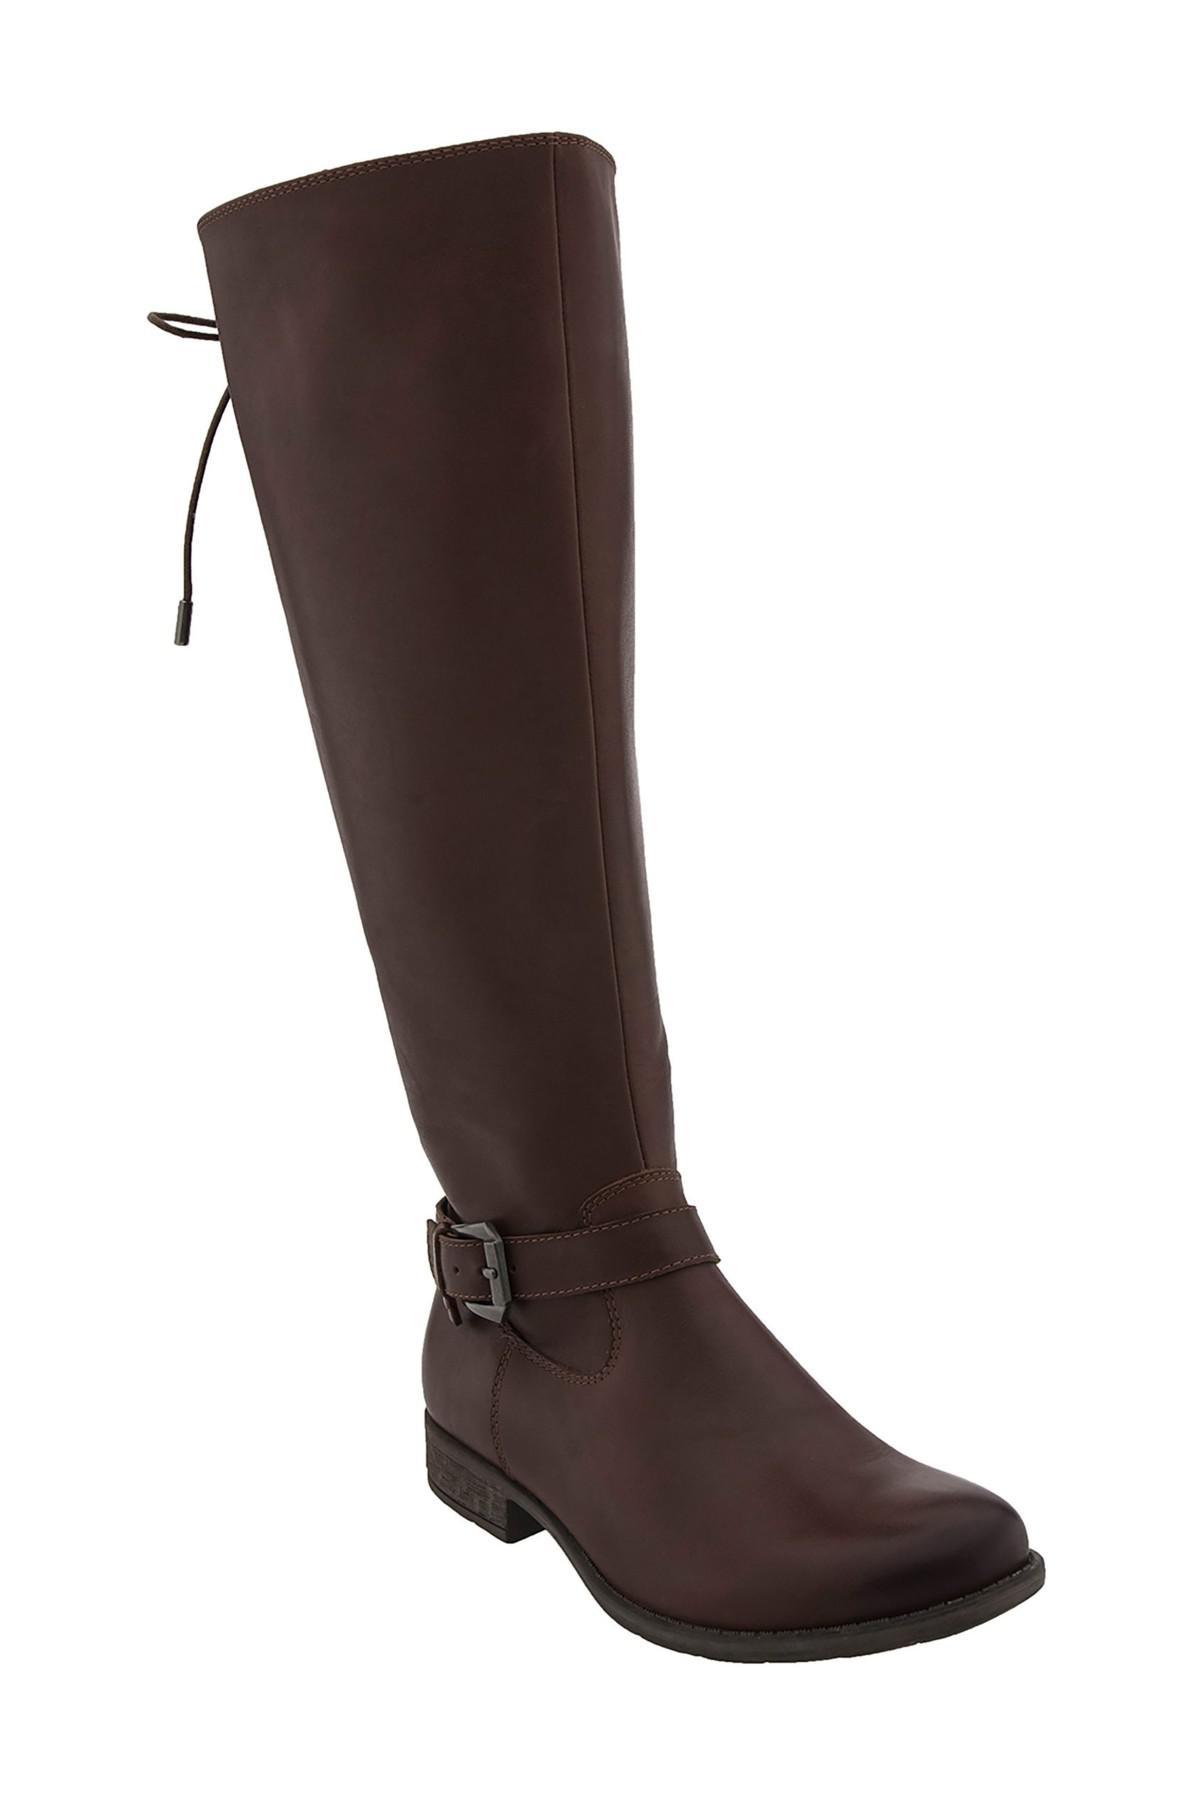 Earth Raleigh Waterproof Knee High Boot(Women's) -Black Waterproof Leather Cheap Price Cost fYz7M9pOS5